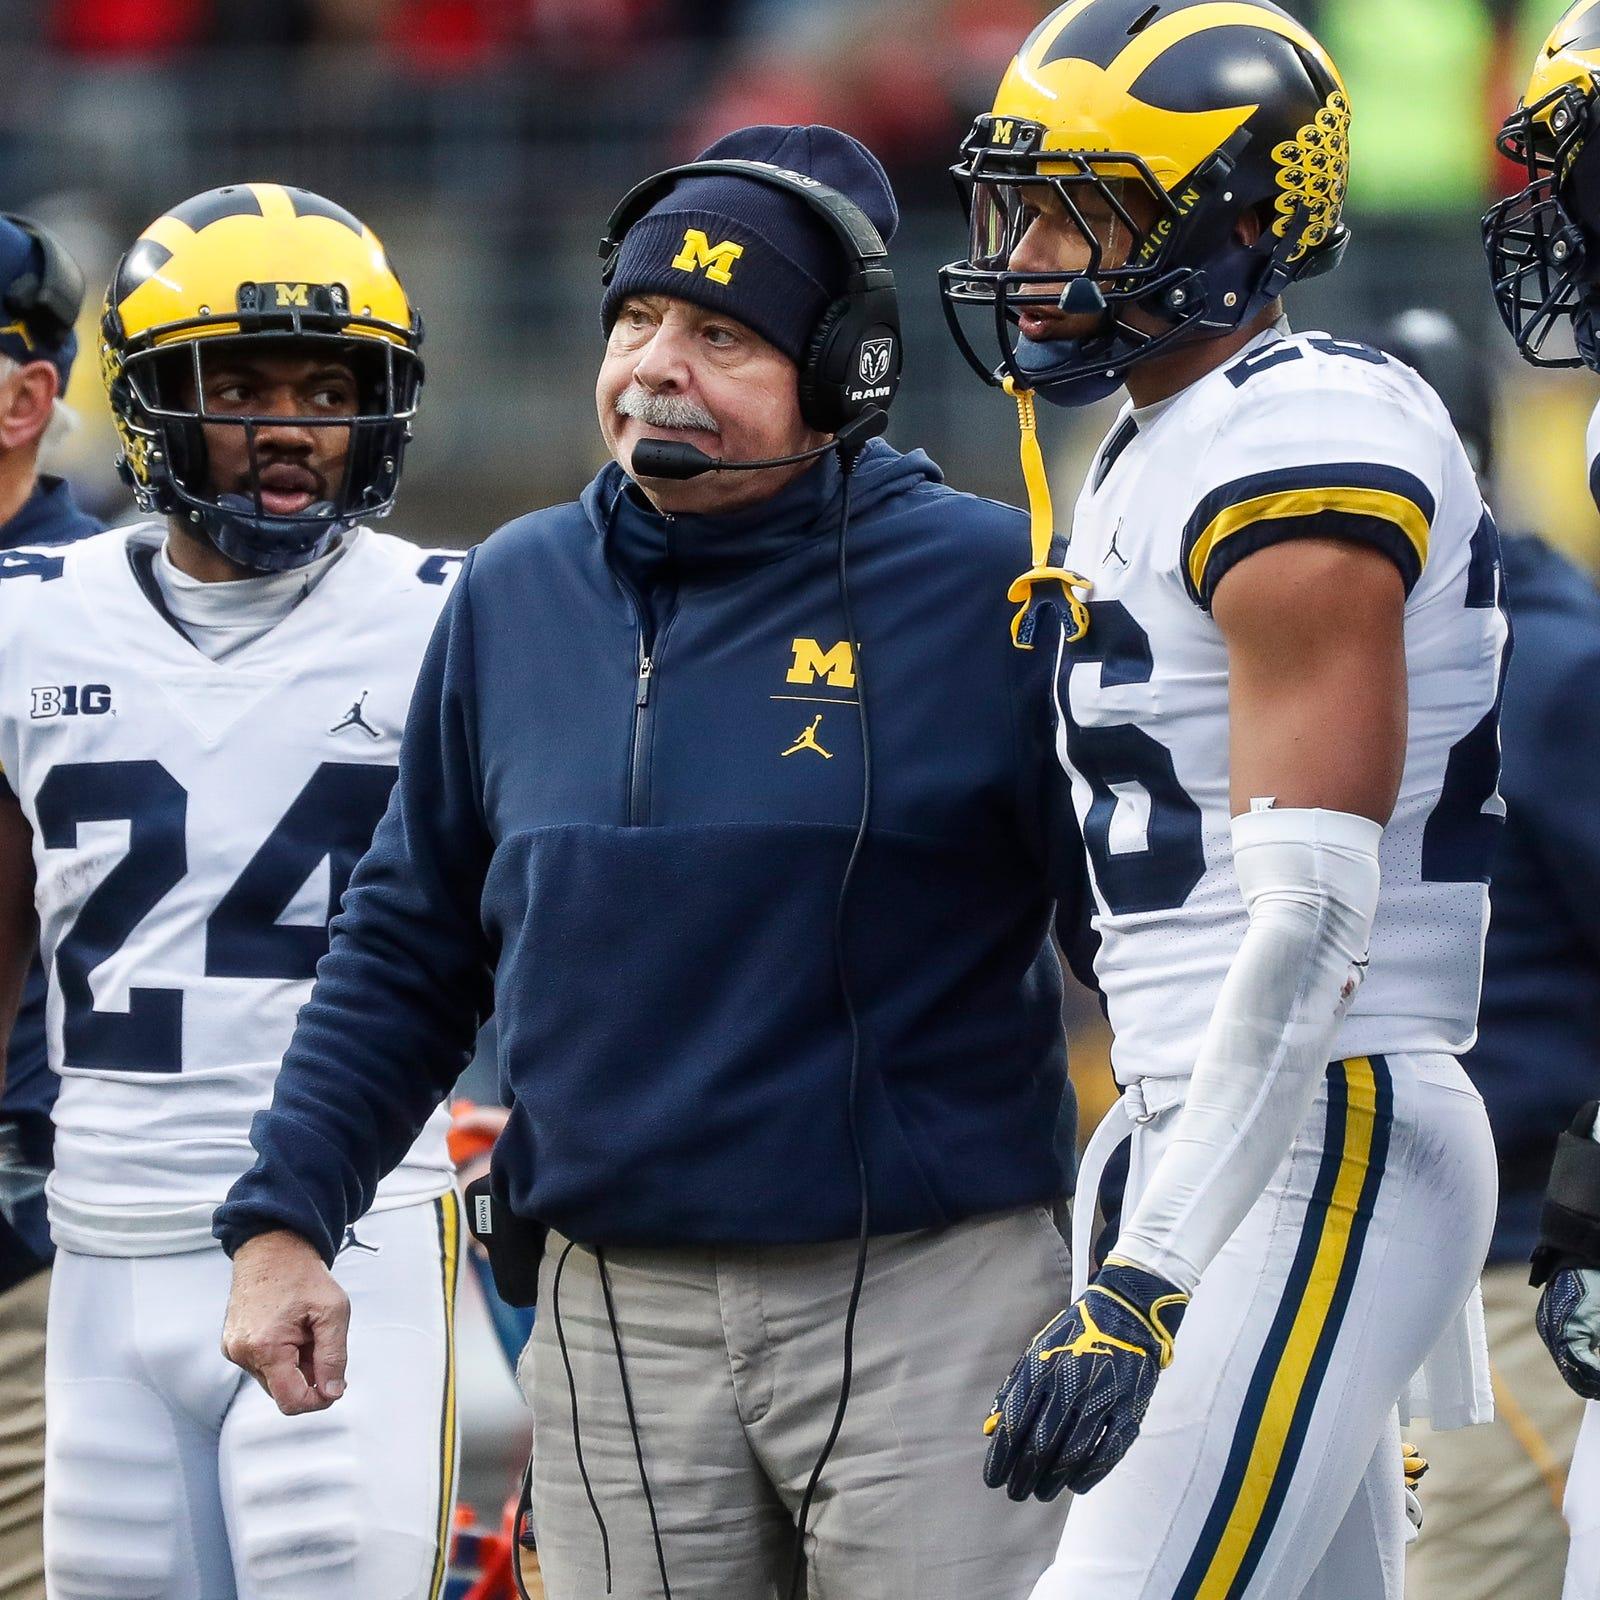 Michigan football: Don Brown's defense faces interesting reset